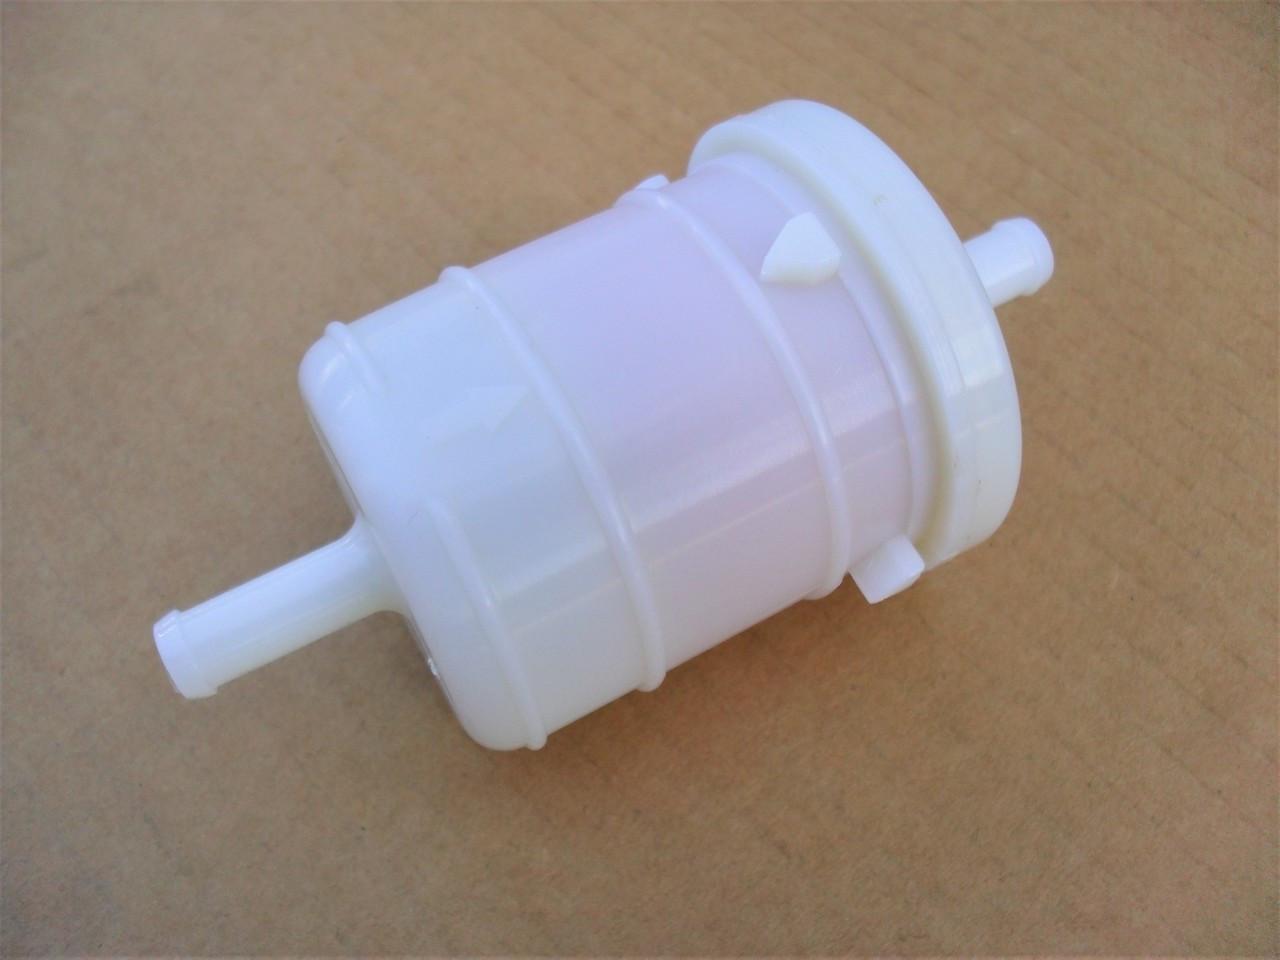 Diesel Fuel Filter For Kubota 1258143010 1258143012 1269143010 Filters 1335143010 12581 43010